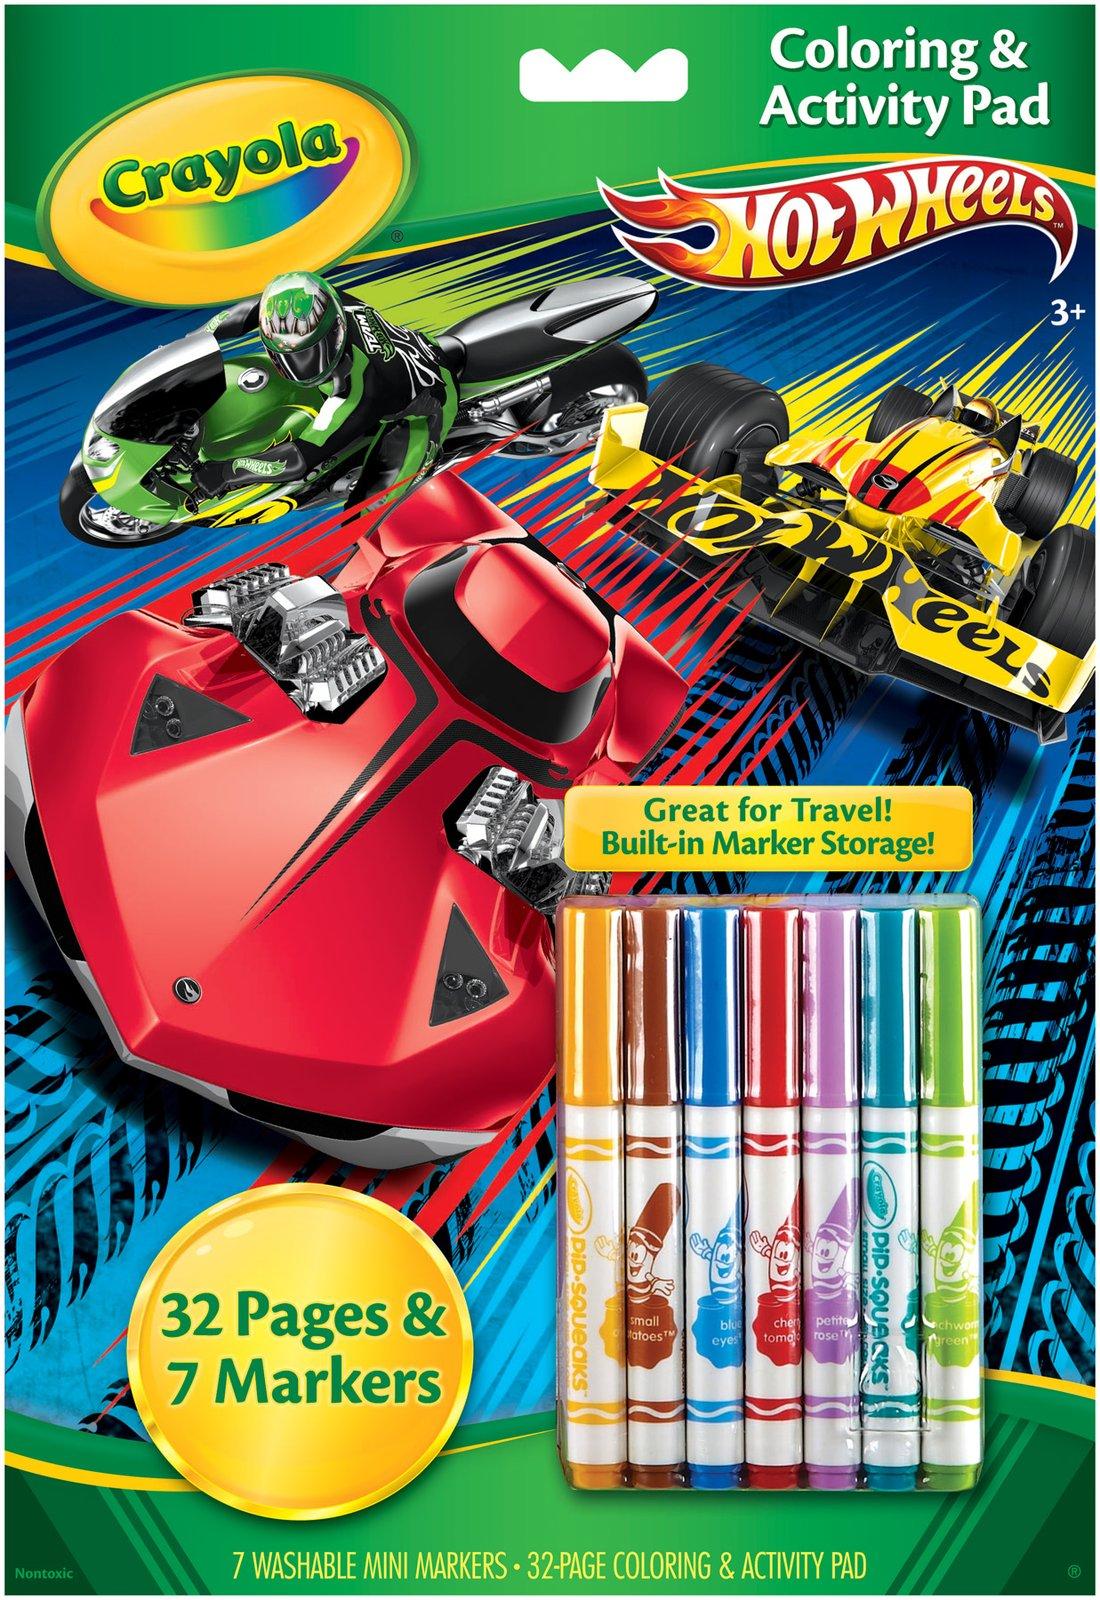 Crayola Coloring & Activity Pad: Hot Wheels แผ่นภาพระบายสี และกิจกรรม ลายรถแข่ง